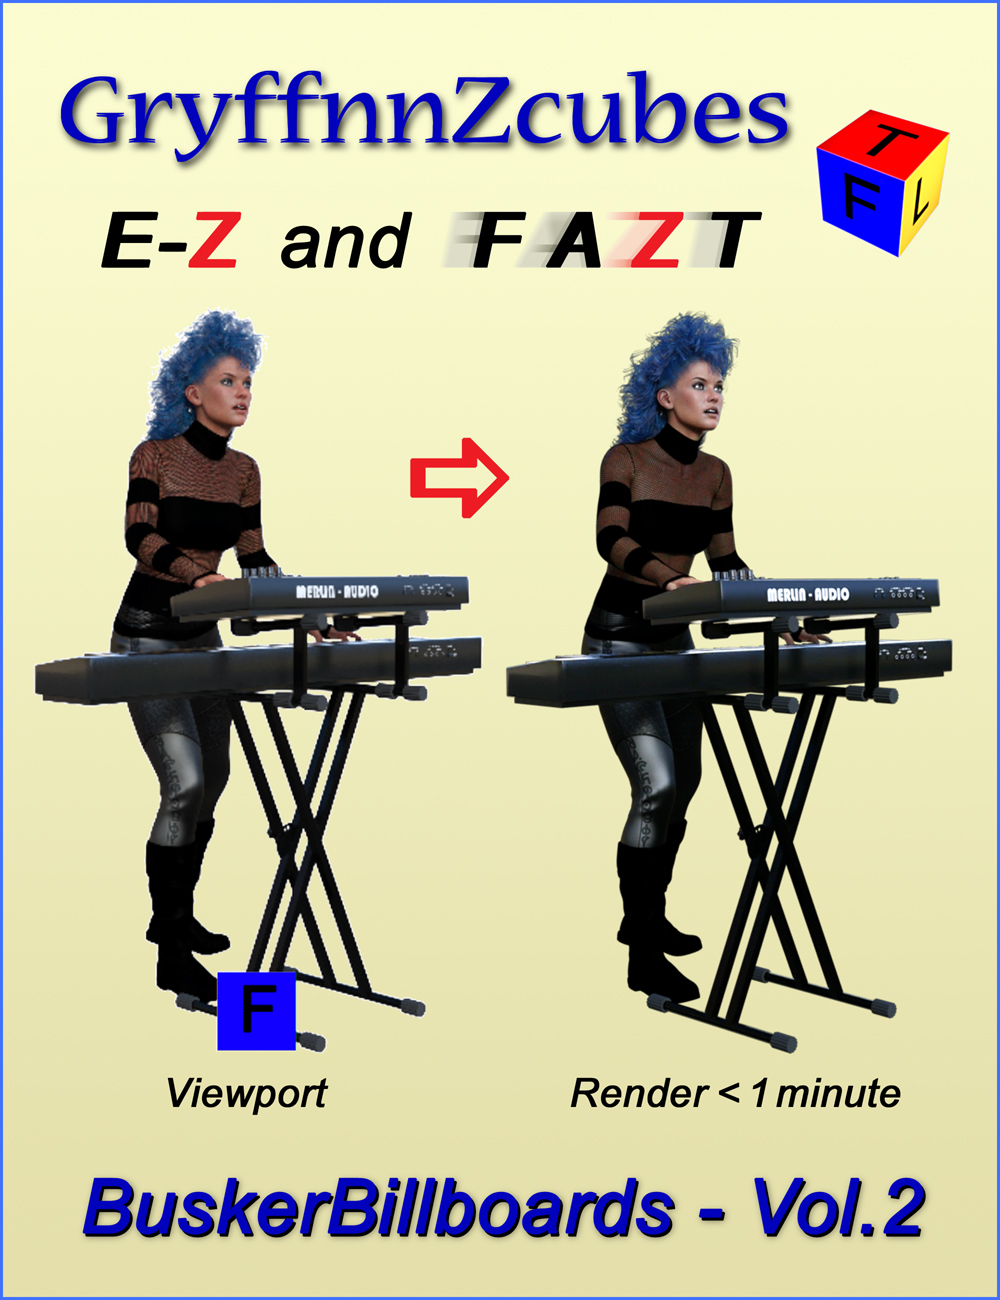 GryffnnZcube Busker Billboards - Volume 2 by: gryffnn / Elisa Griffin, 3D Models by Daz 3D